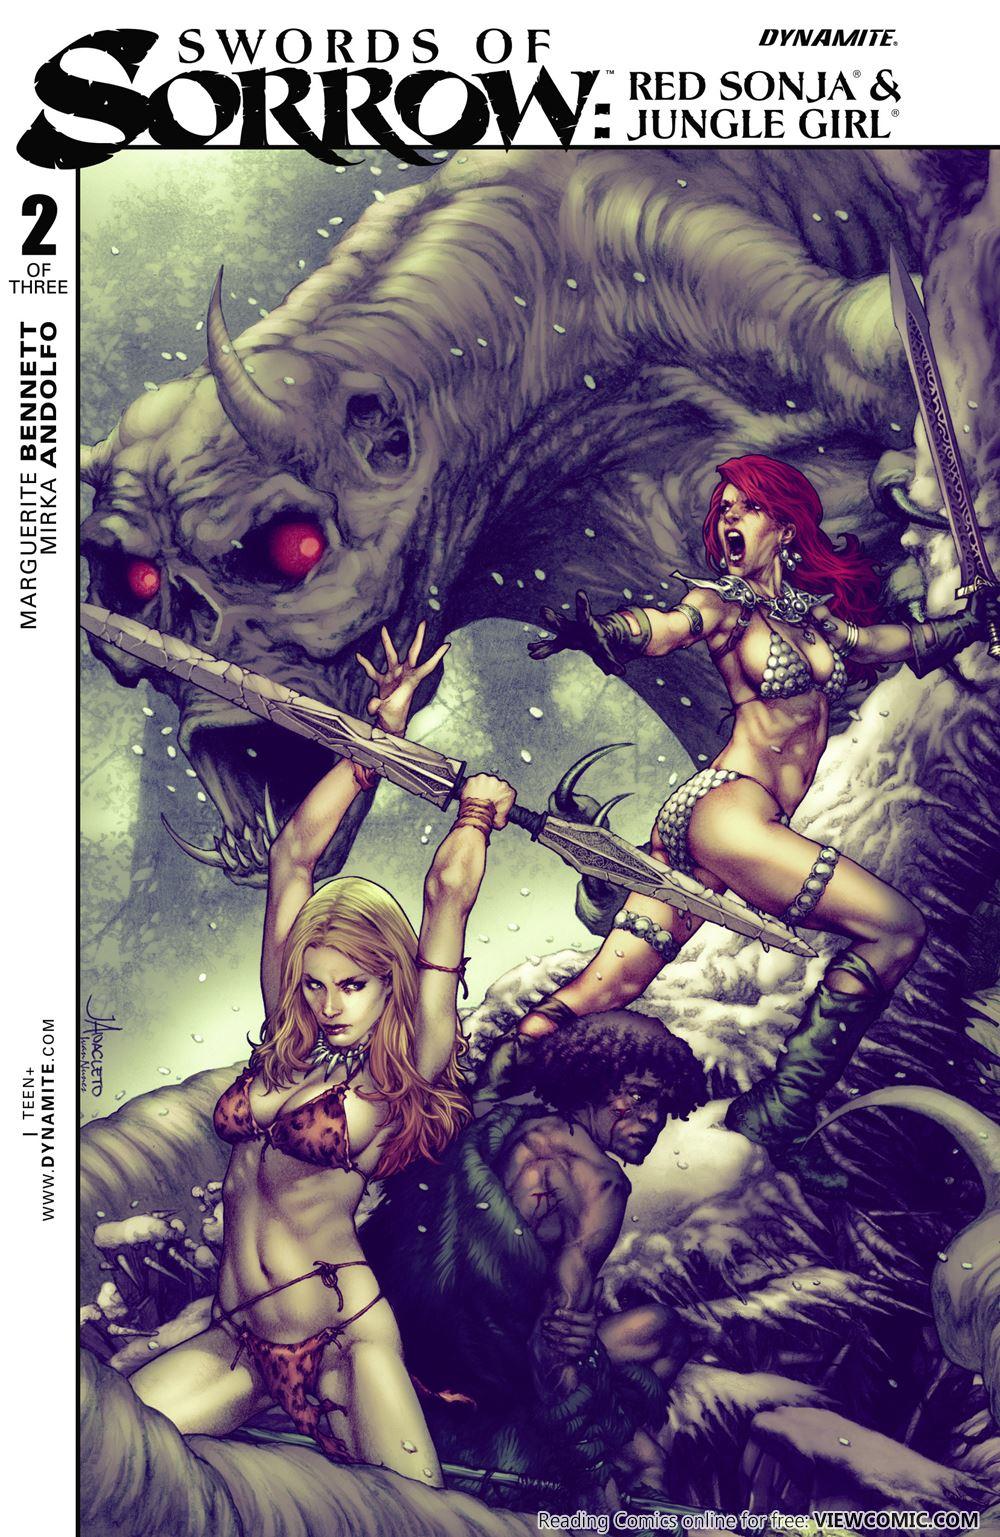 Swords of Sorrow – Red Sonja & Jungle Girl | Viewcomic reading